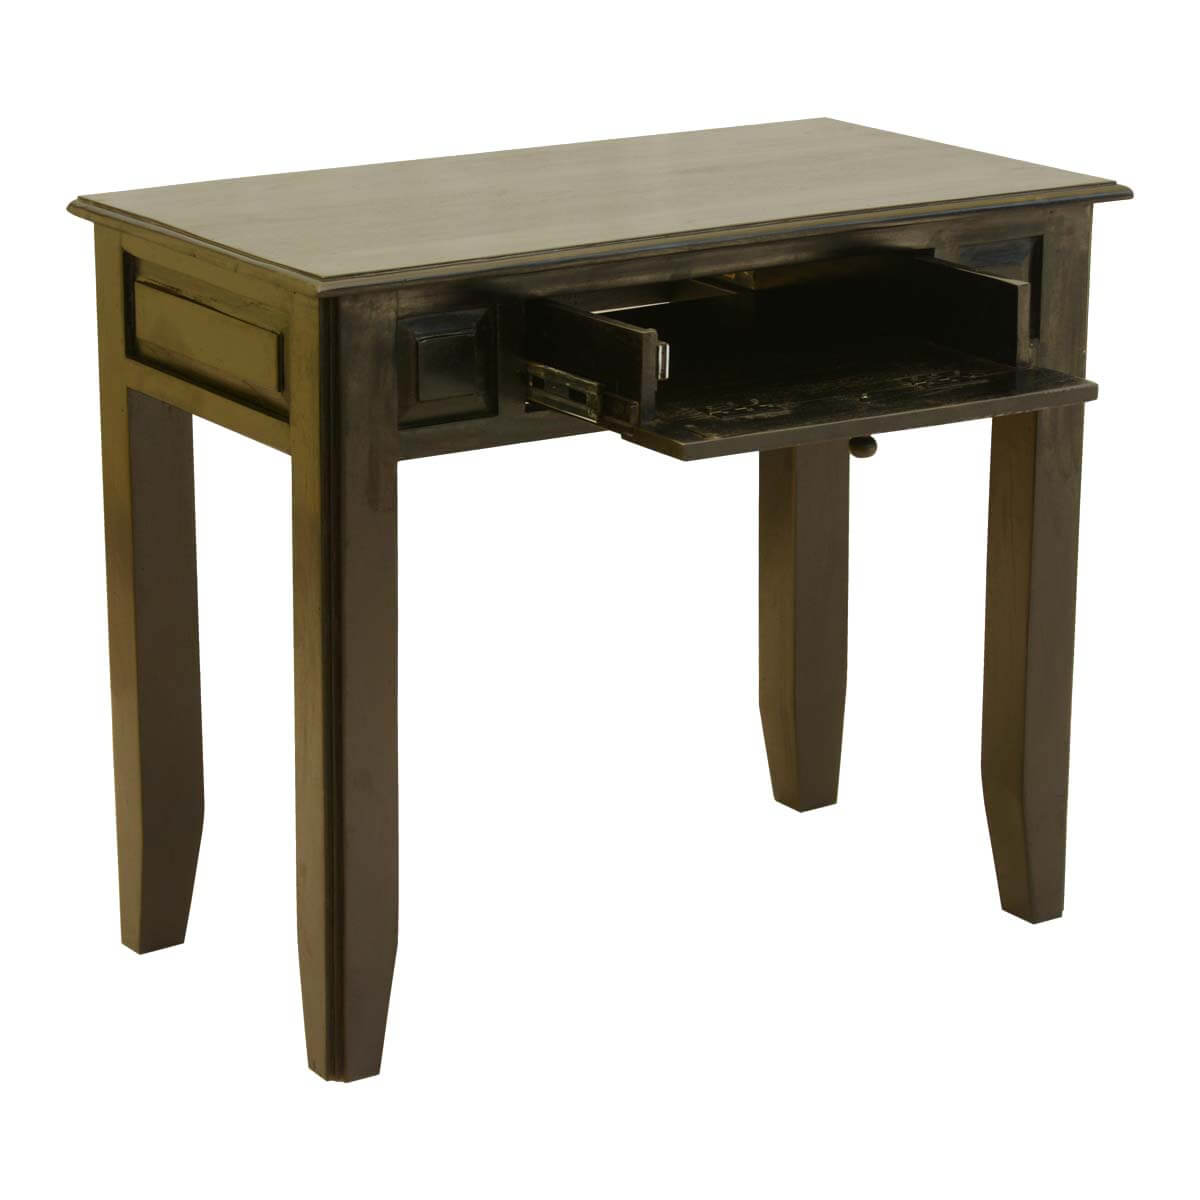 Beau Colonial Mango Wood Console Table Desk W Drawer